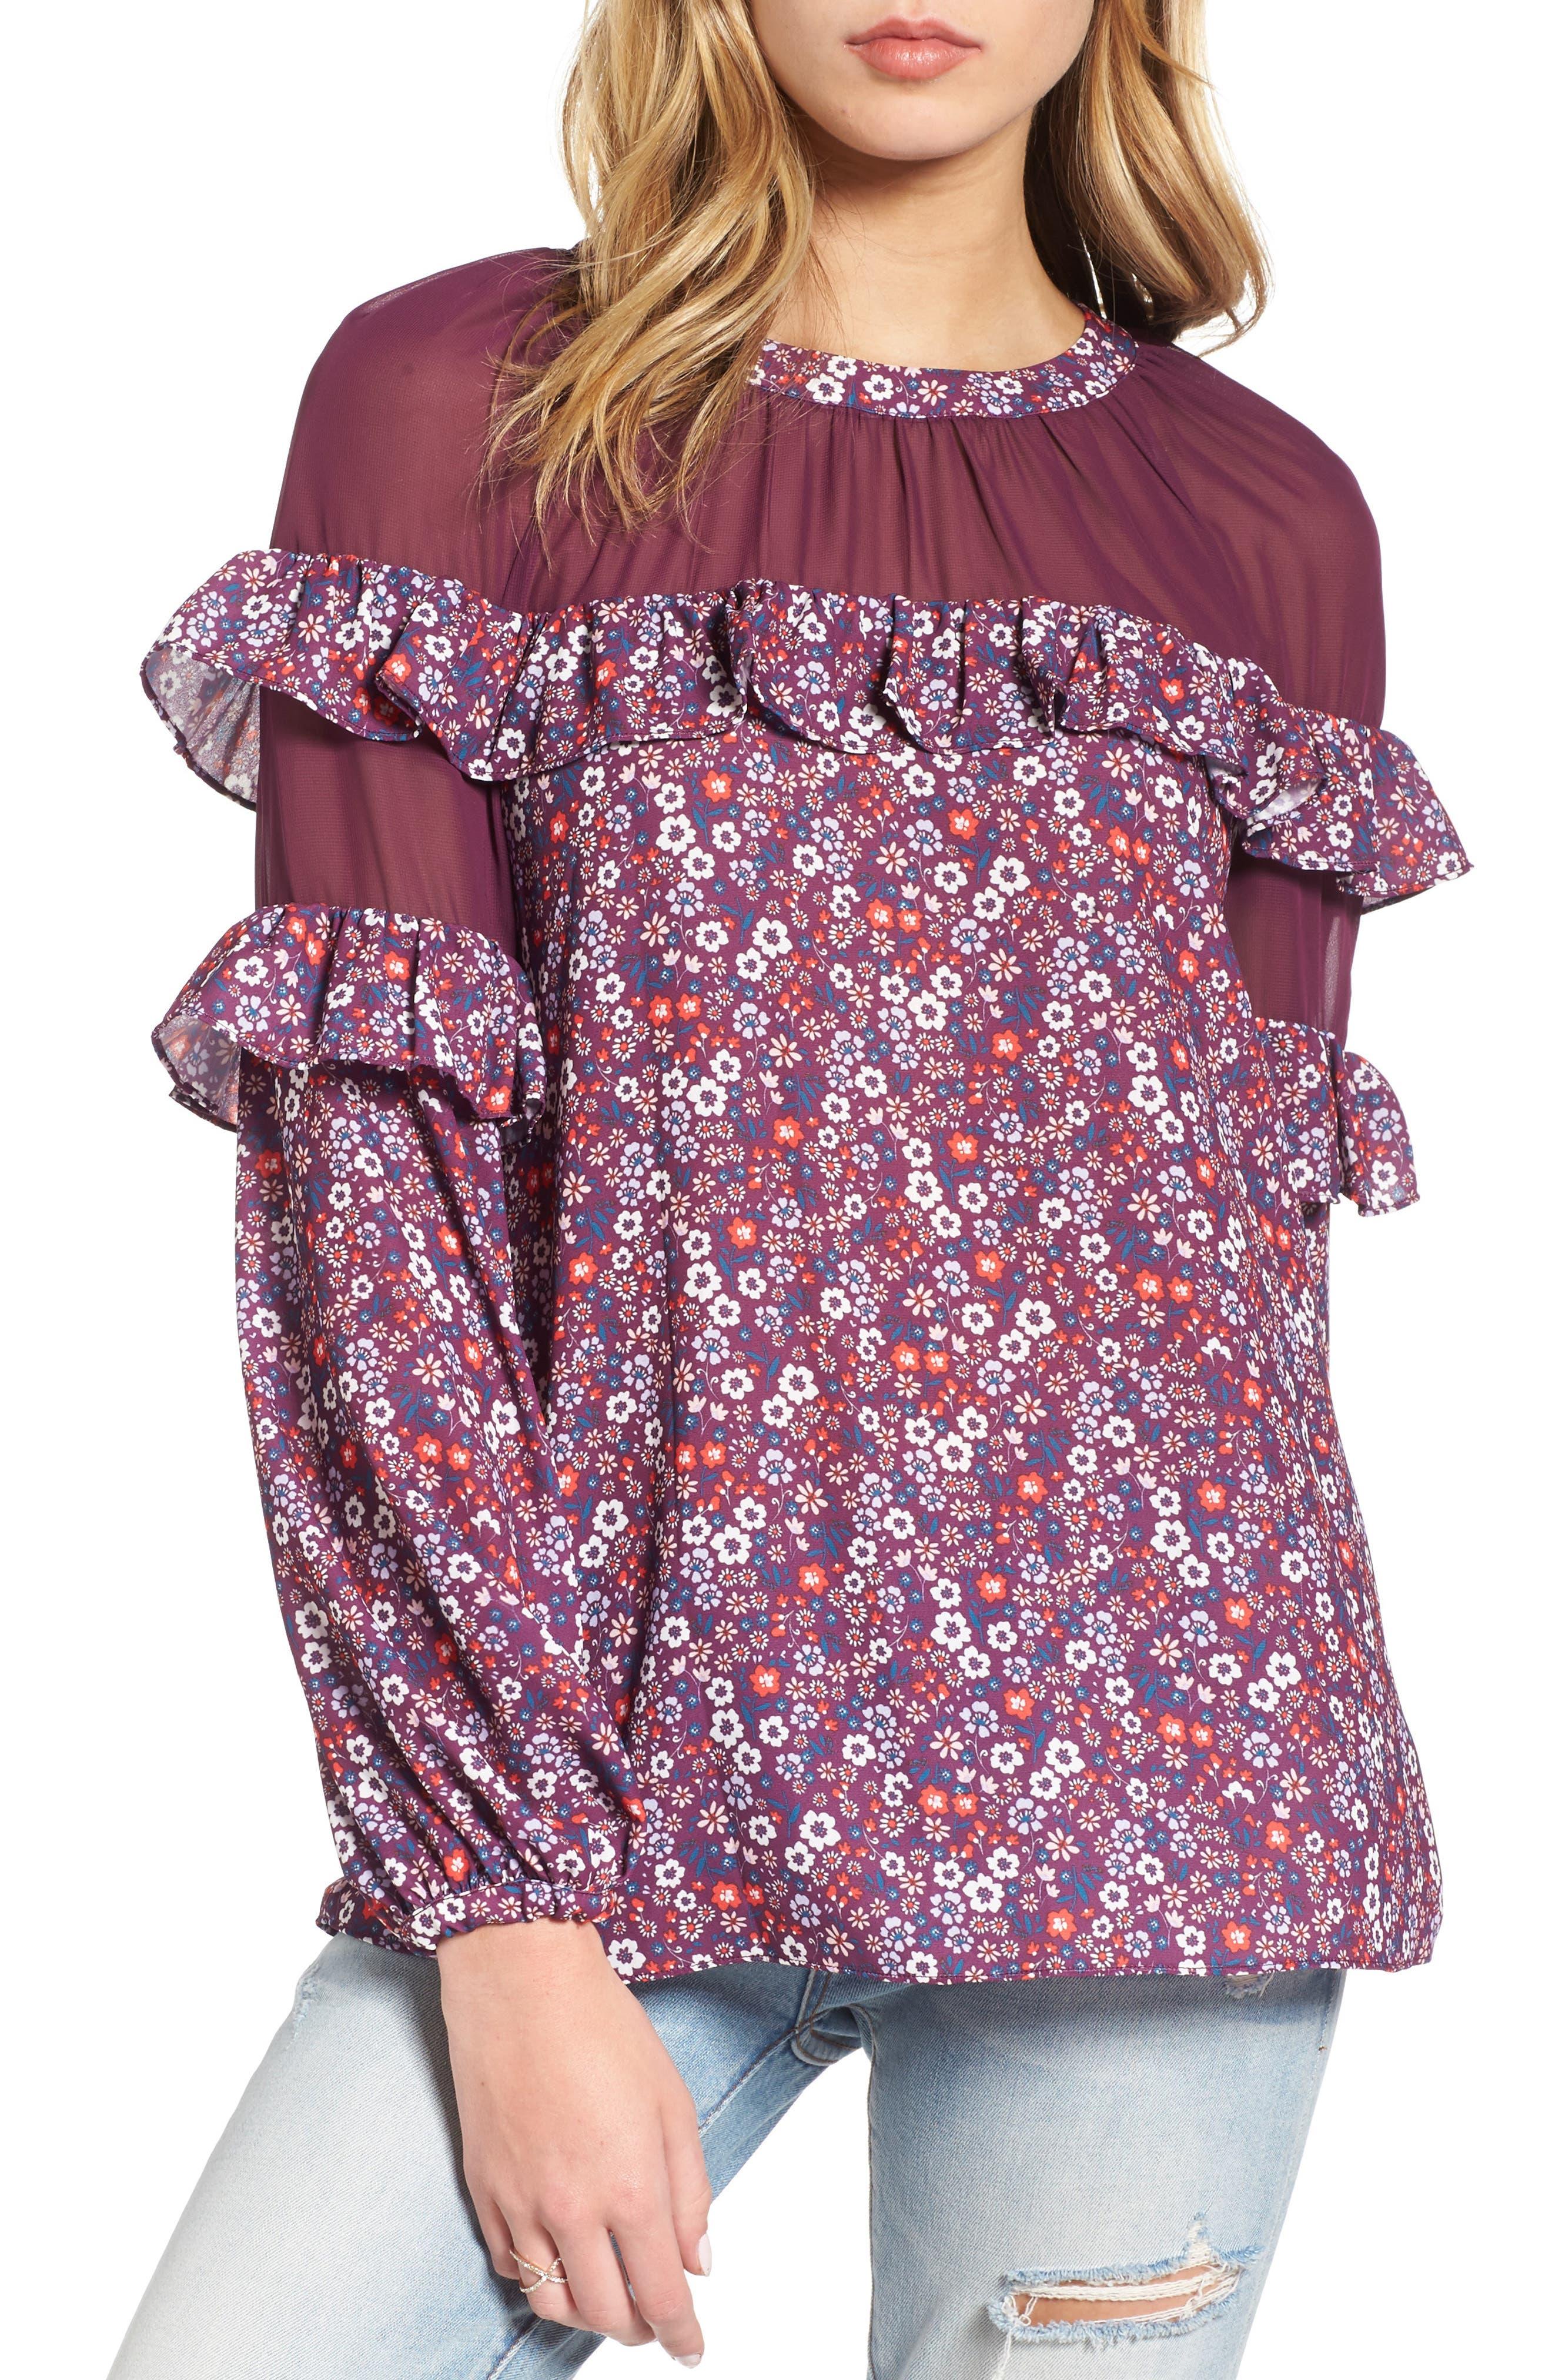 Heidi Ruffle Blouse,                             Main thumbnail 1, color,                             Magnolia